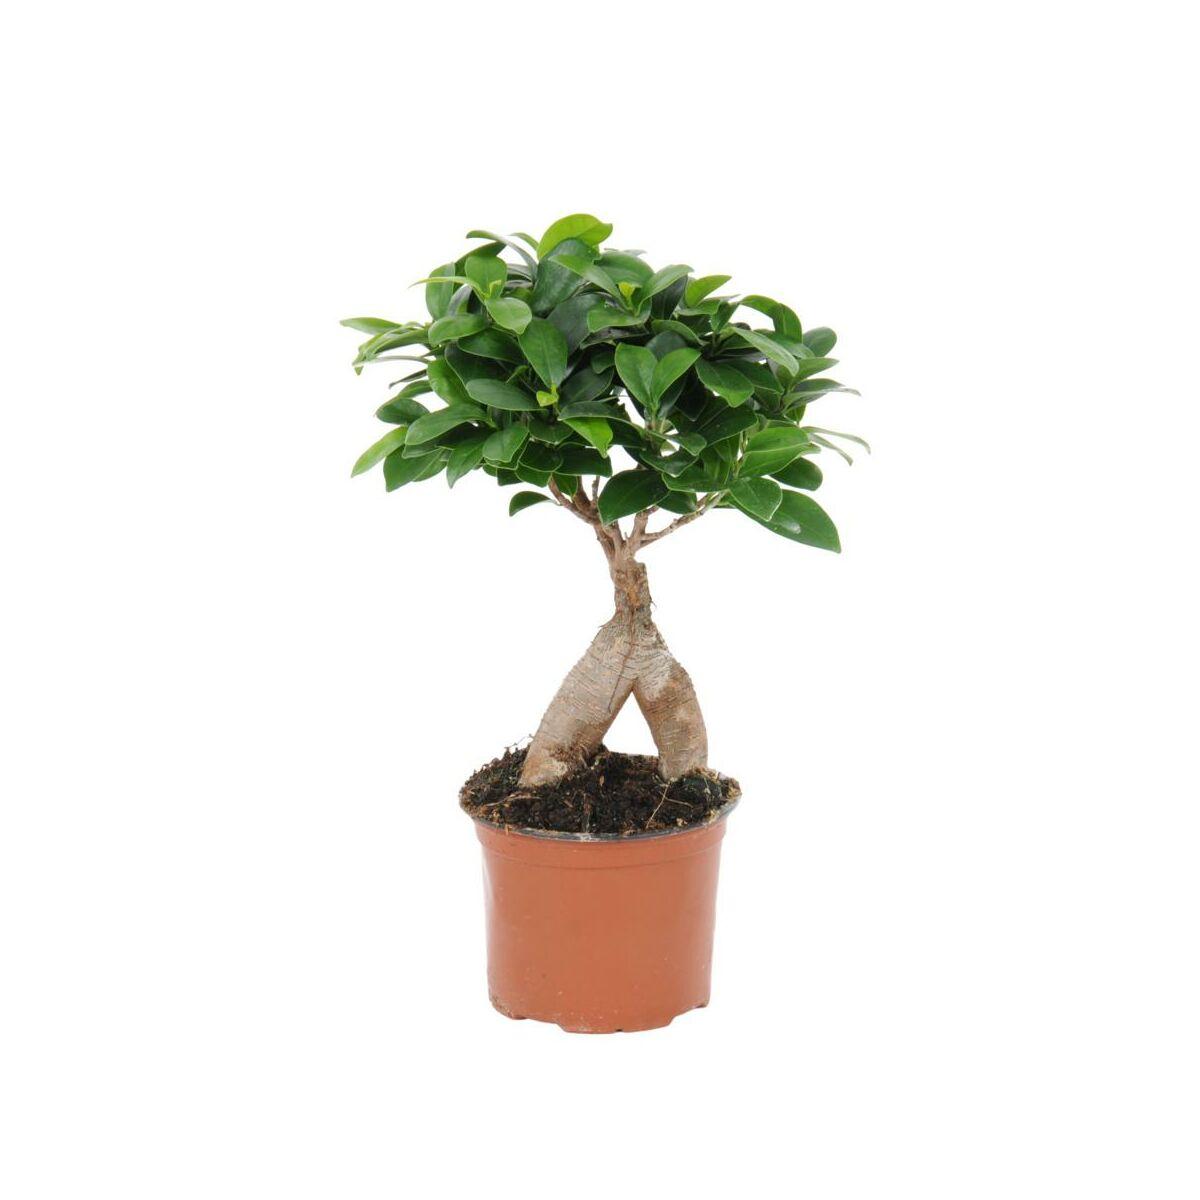 Ginseng Bonsai - Nails Fashion Ficus Ginseng Bonsai Einpflanzen Tipps